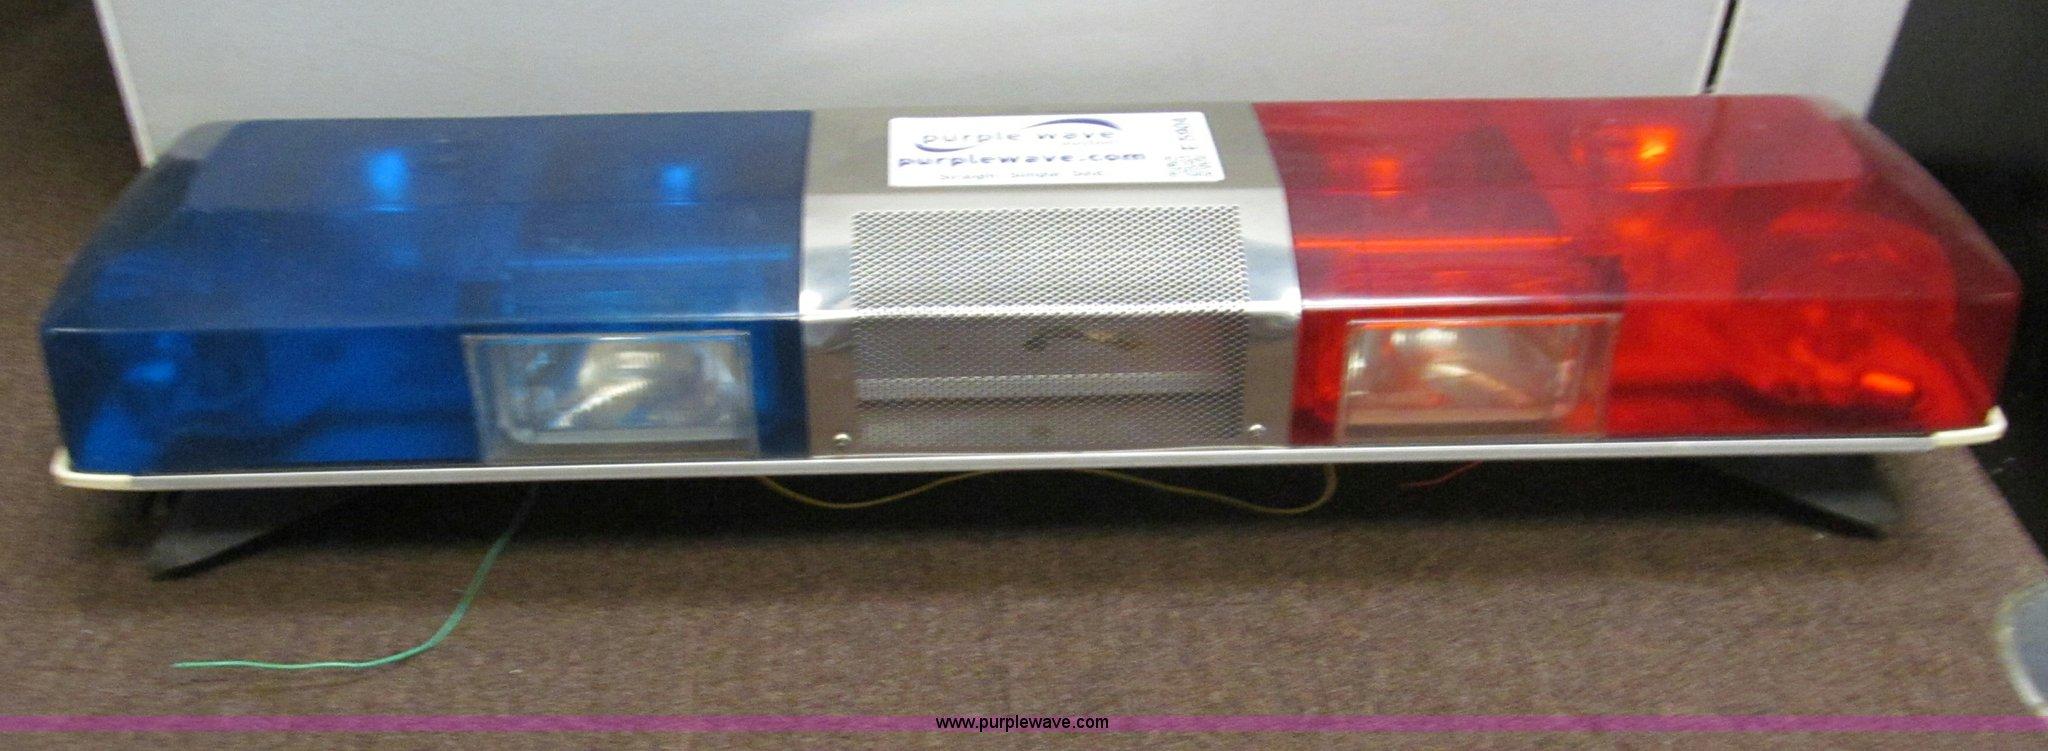 Smithwesson police light bar item e5904 sold april e5904 image for item e5904 smithwesson police light bar aloadofball Images